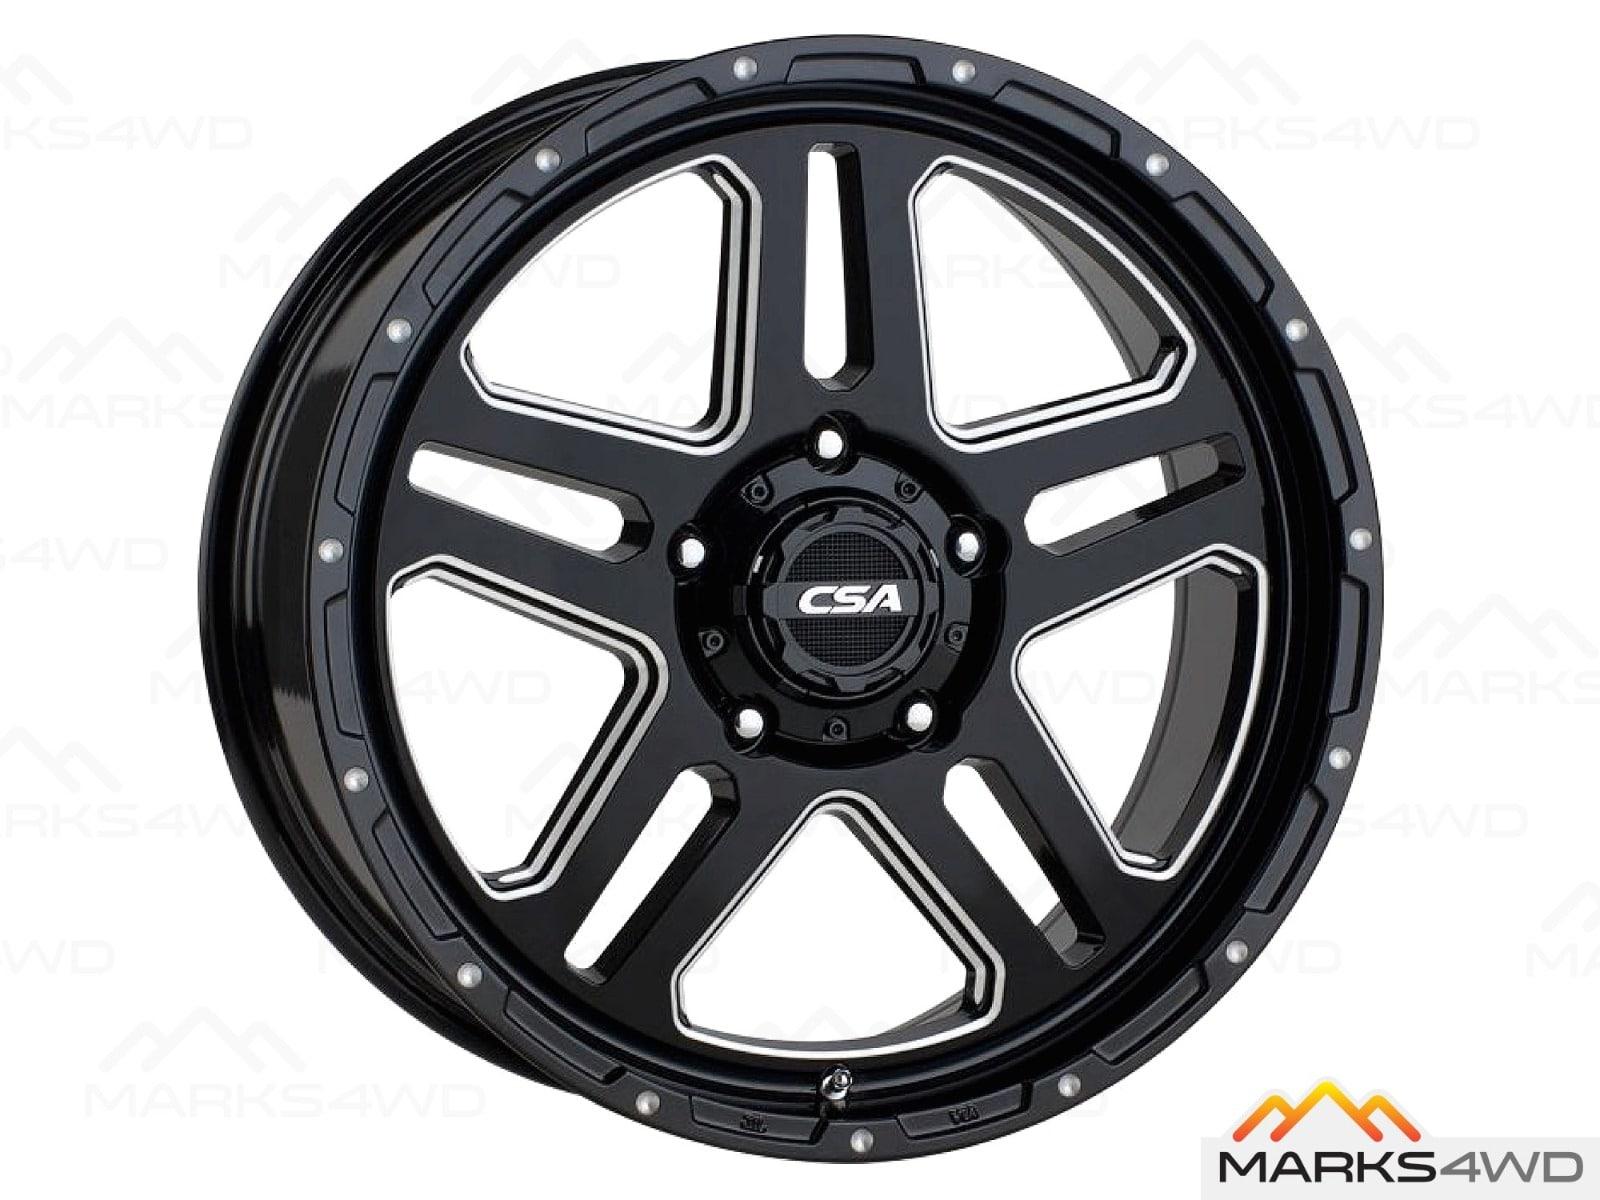 CSA Bronx Wheel